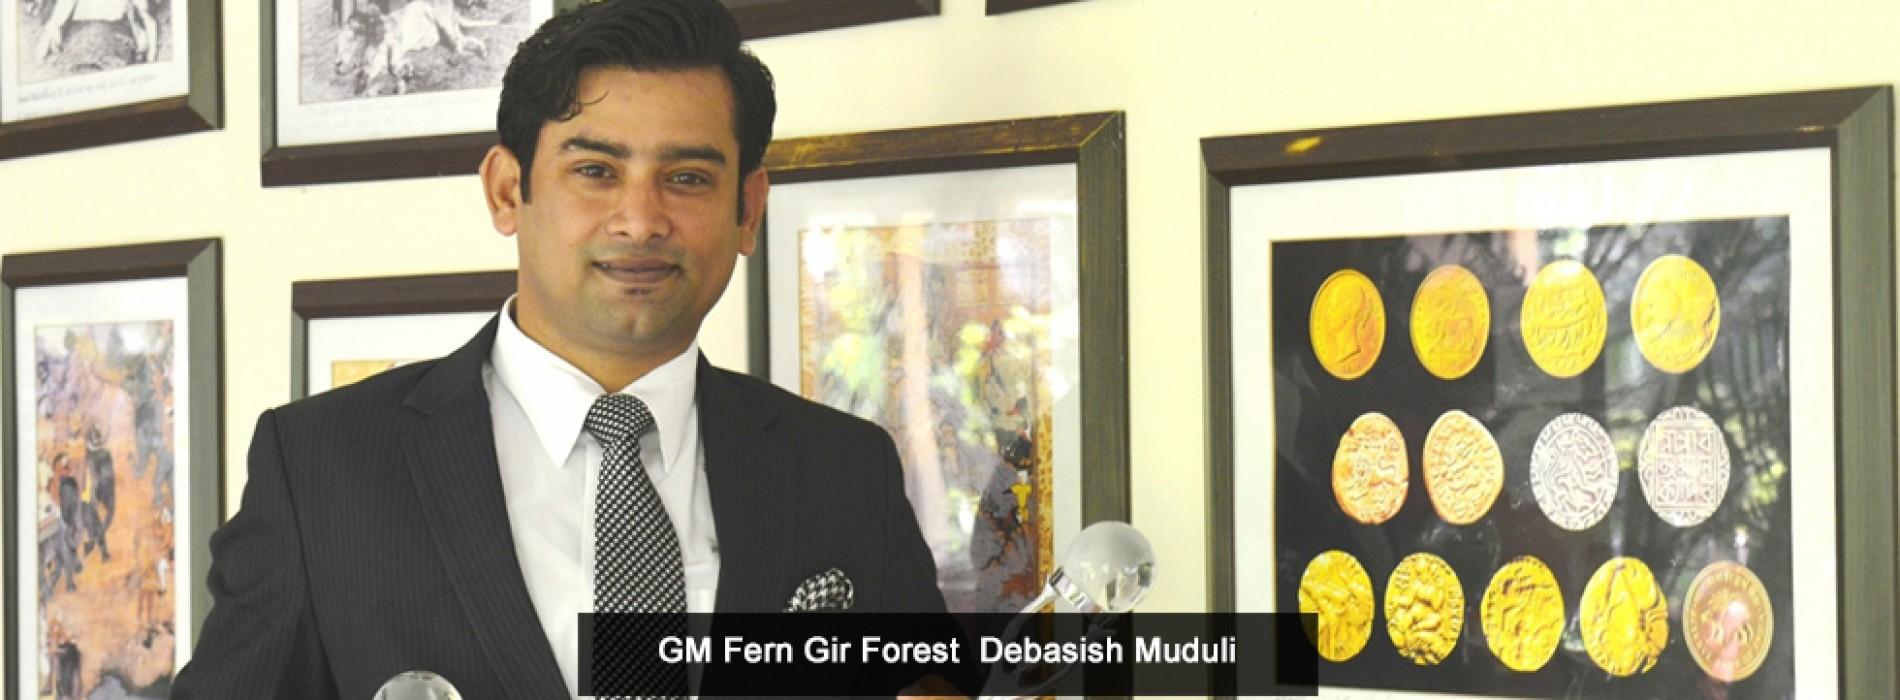 "Gujarat Tourism declares The Fern Gir Forest Resort as ""The Best Resort of Gujarat"""